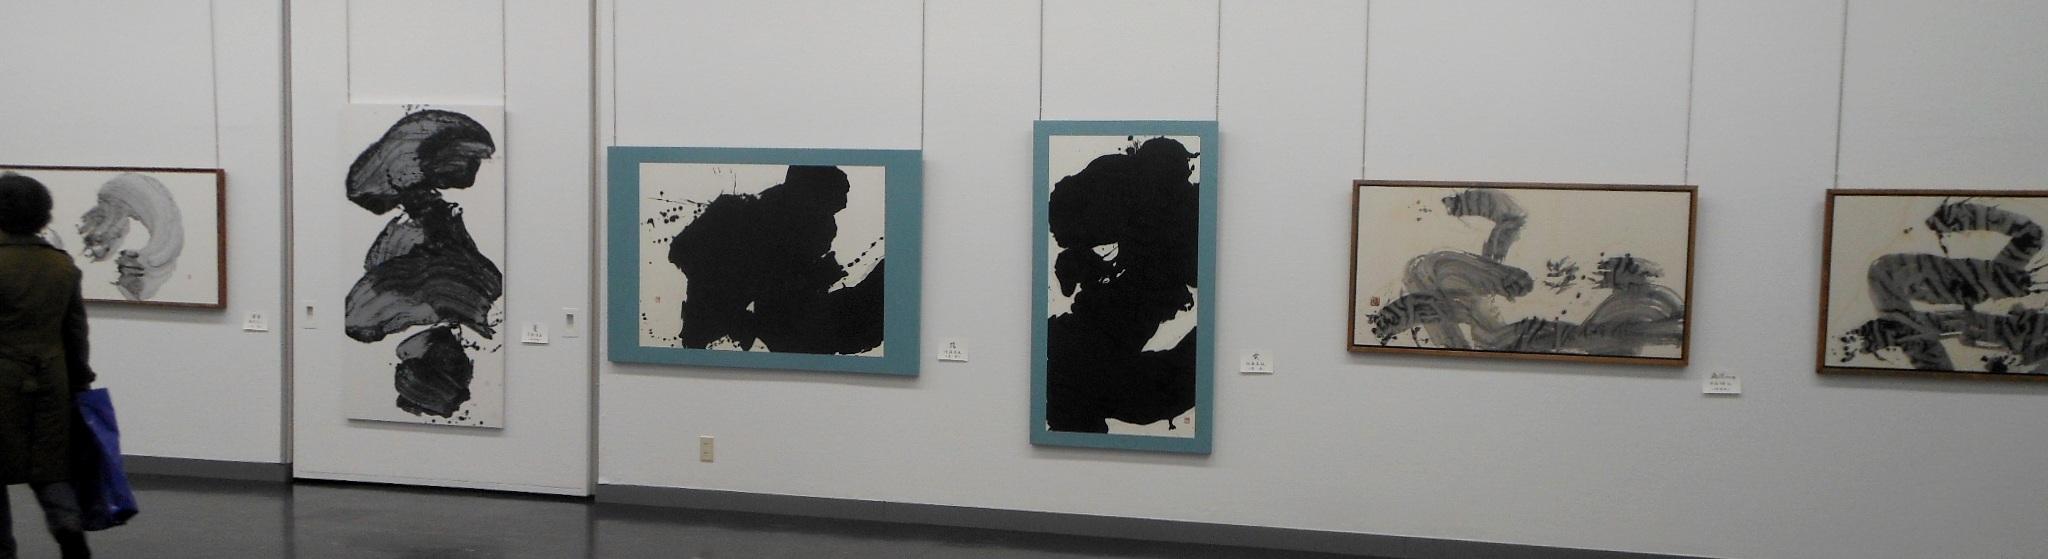 1690)「第26回 北海道墨人展」 市民ギャラリー 4月4日(水)~4月8日(日) _f0126829_16302728.jpg